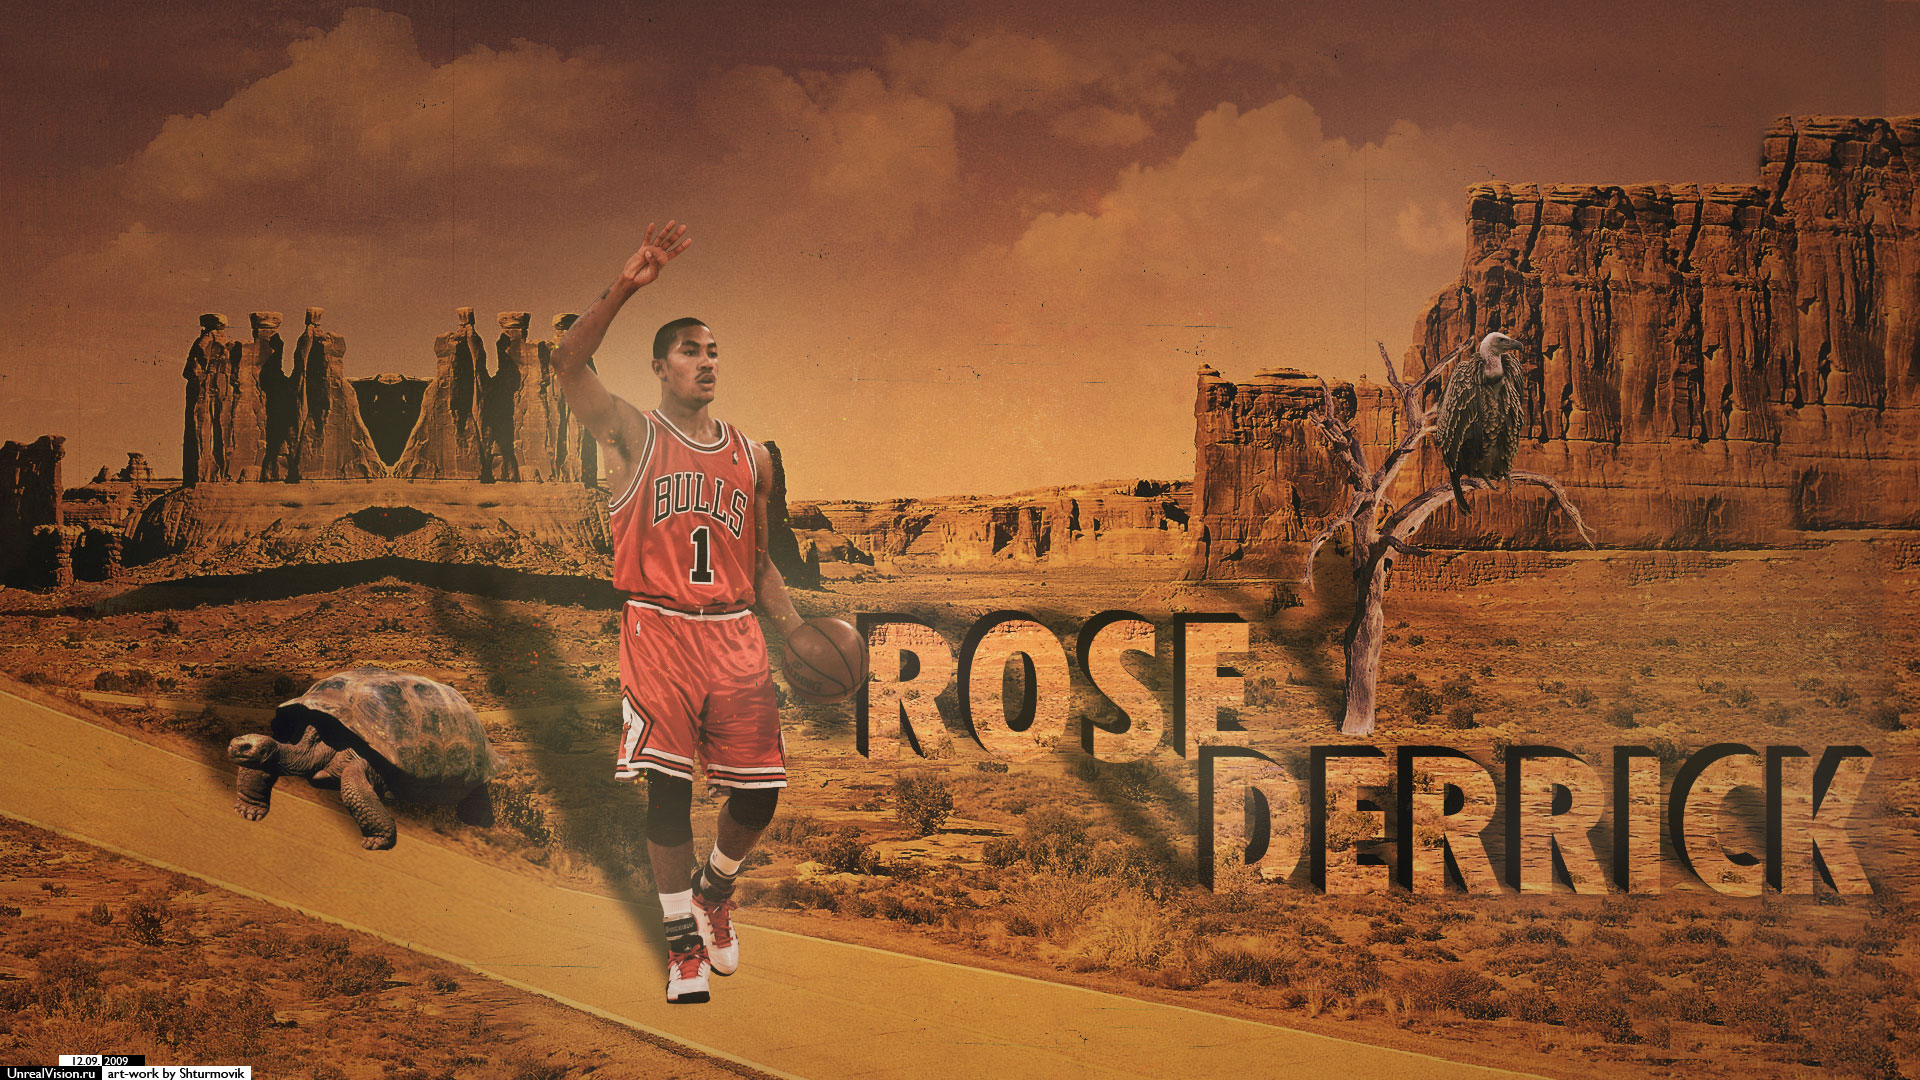 related derrick rose bulls 05 24 2011 derrick rose 1st playoff game 05 1920x1080